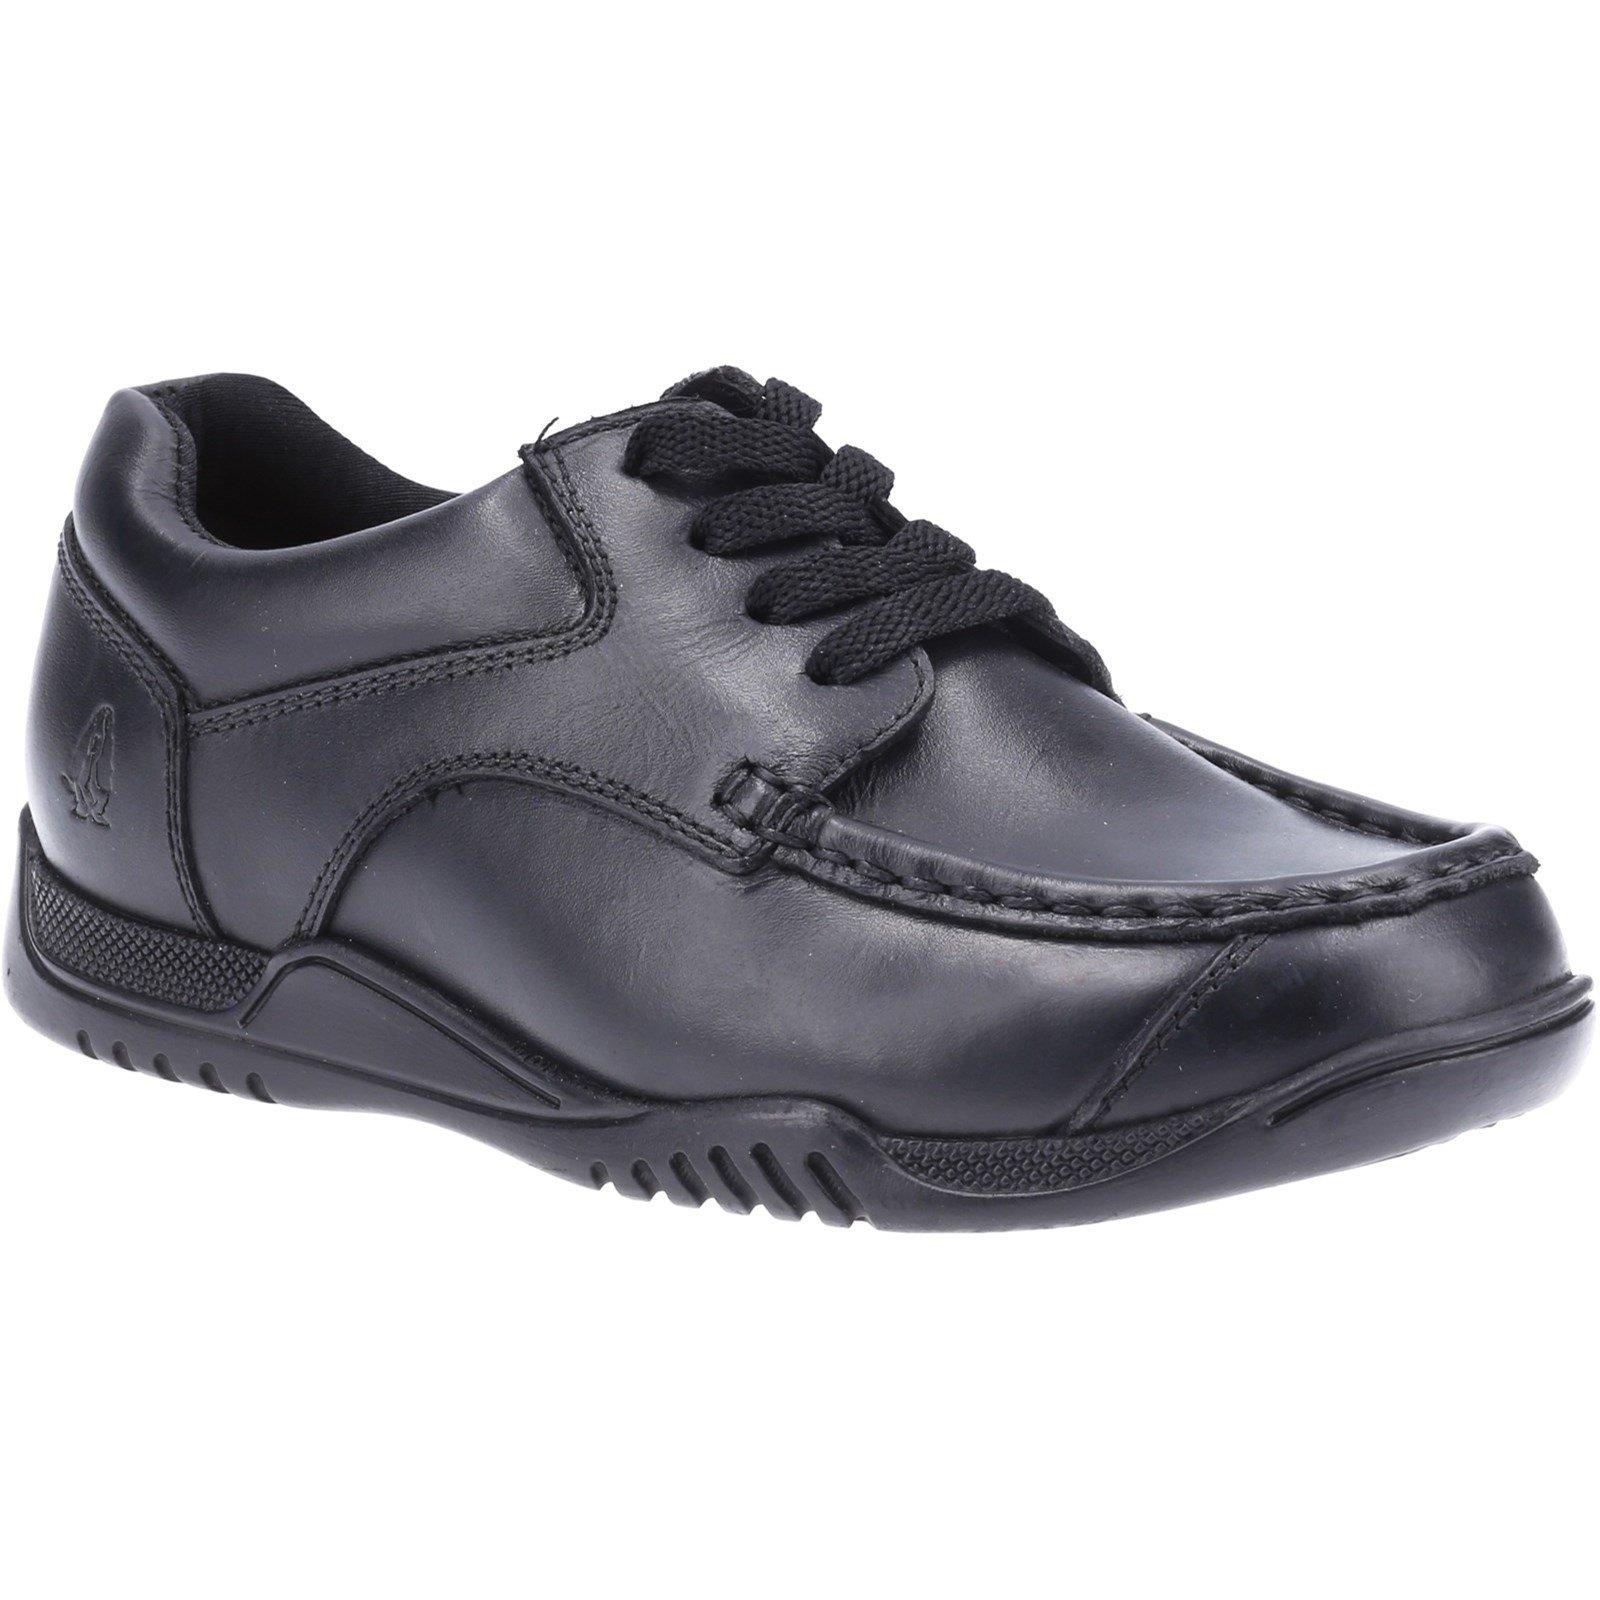 Hush Puppies Kid's Hudson Senior School Shoe Black 32583 - Black 3